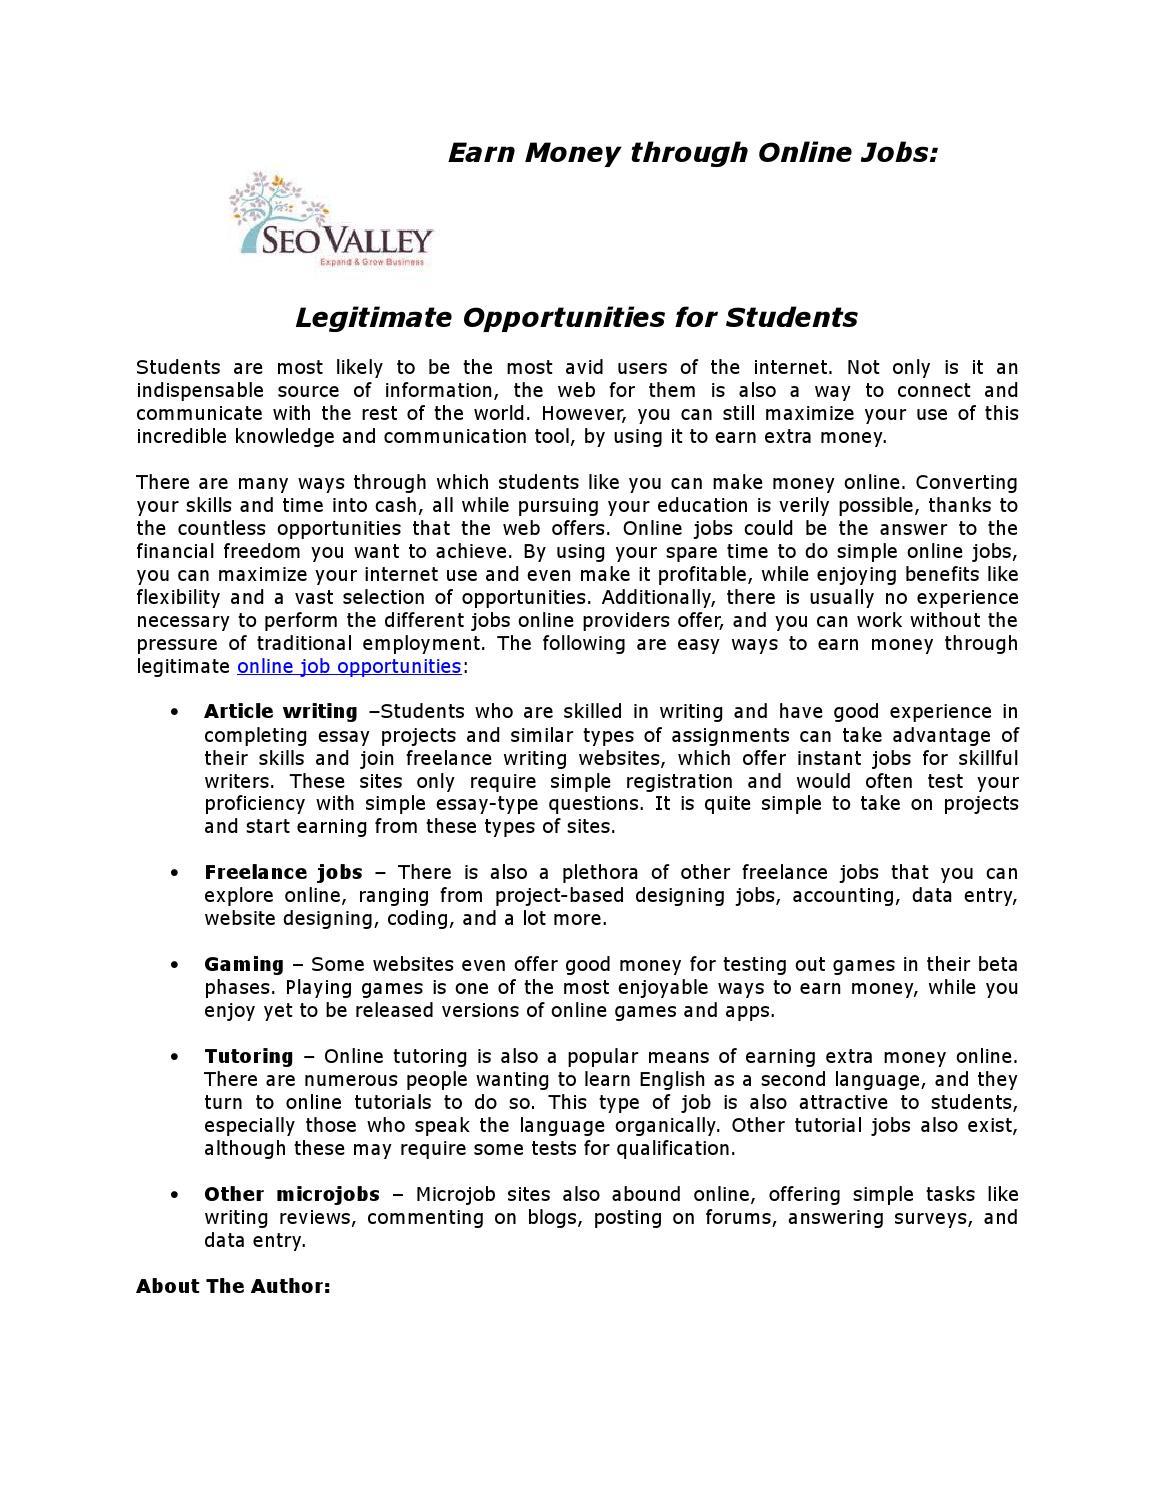 Essaytyper com online services inc company